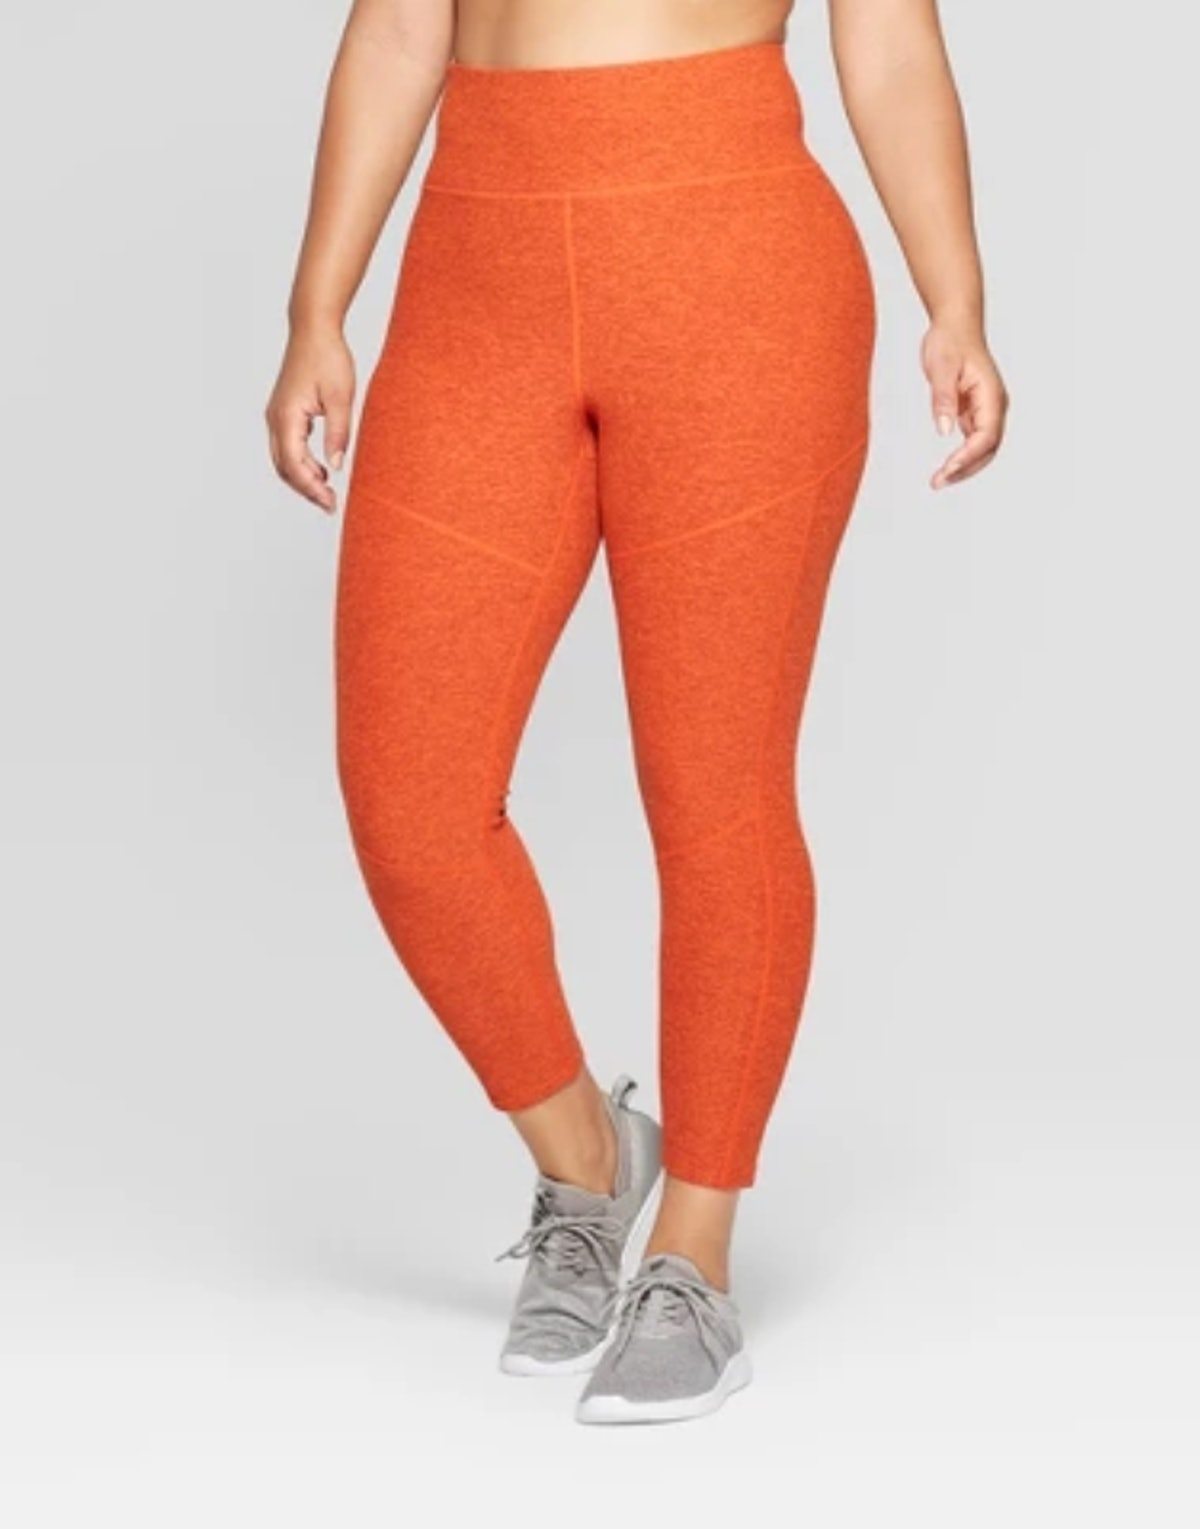 Women's Plus Mini Stripe 7/8 High-Waisted Leggings - JoyLab